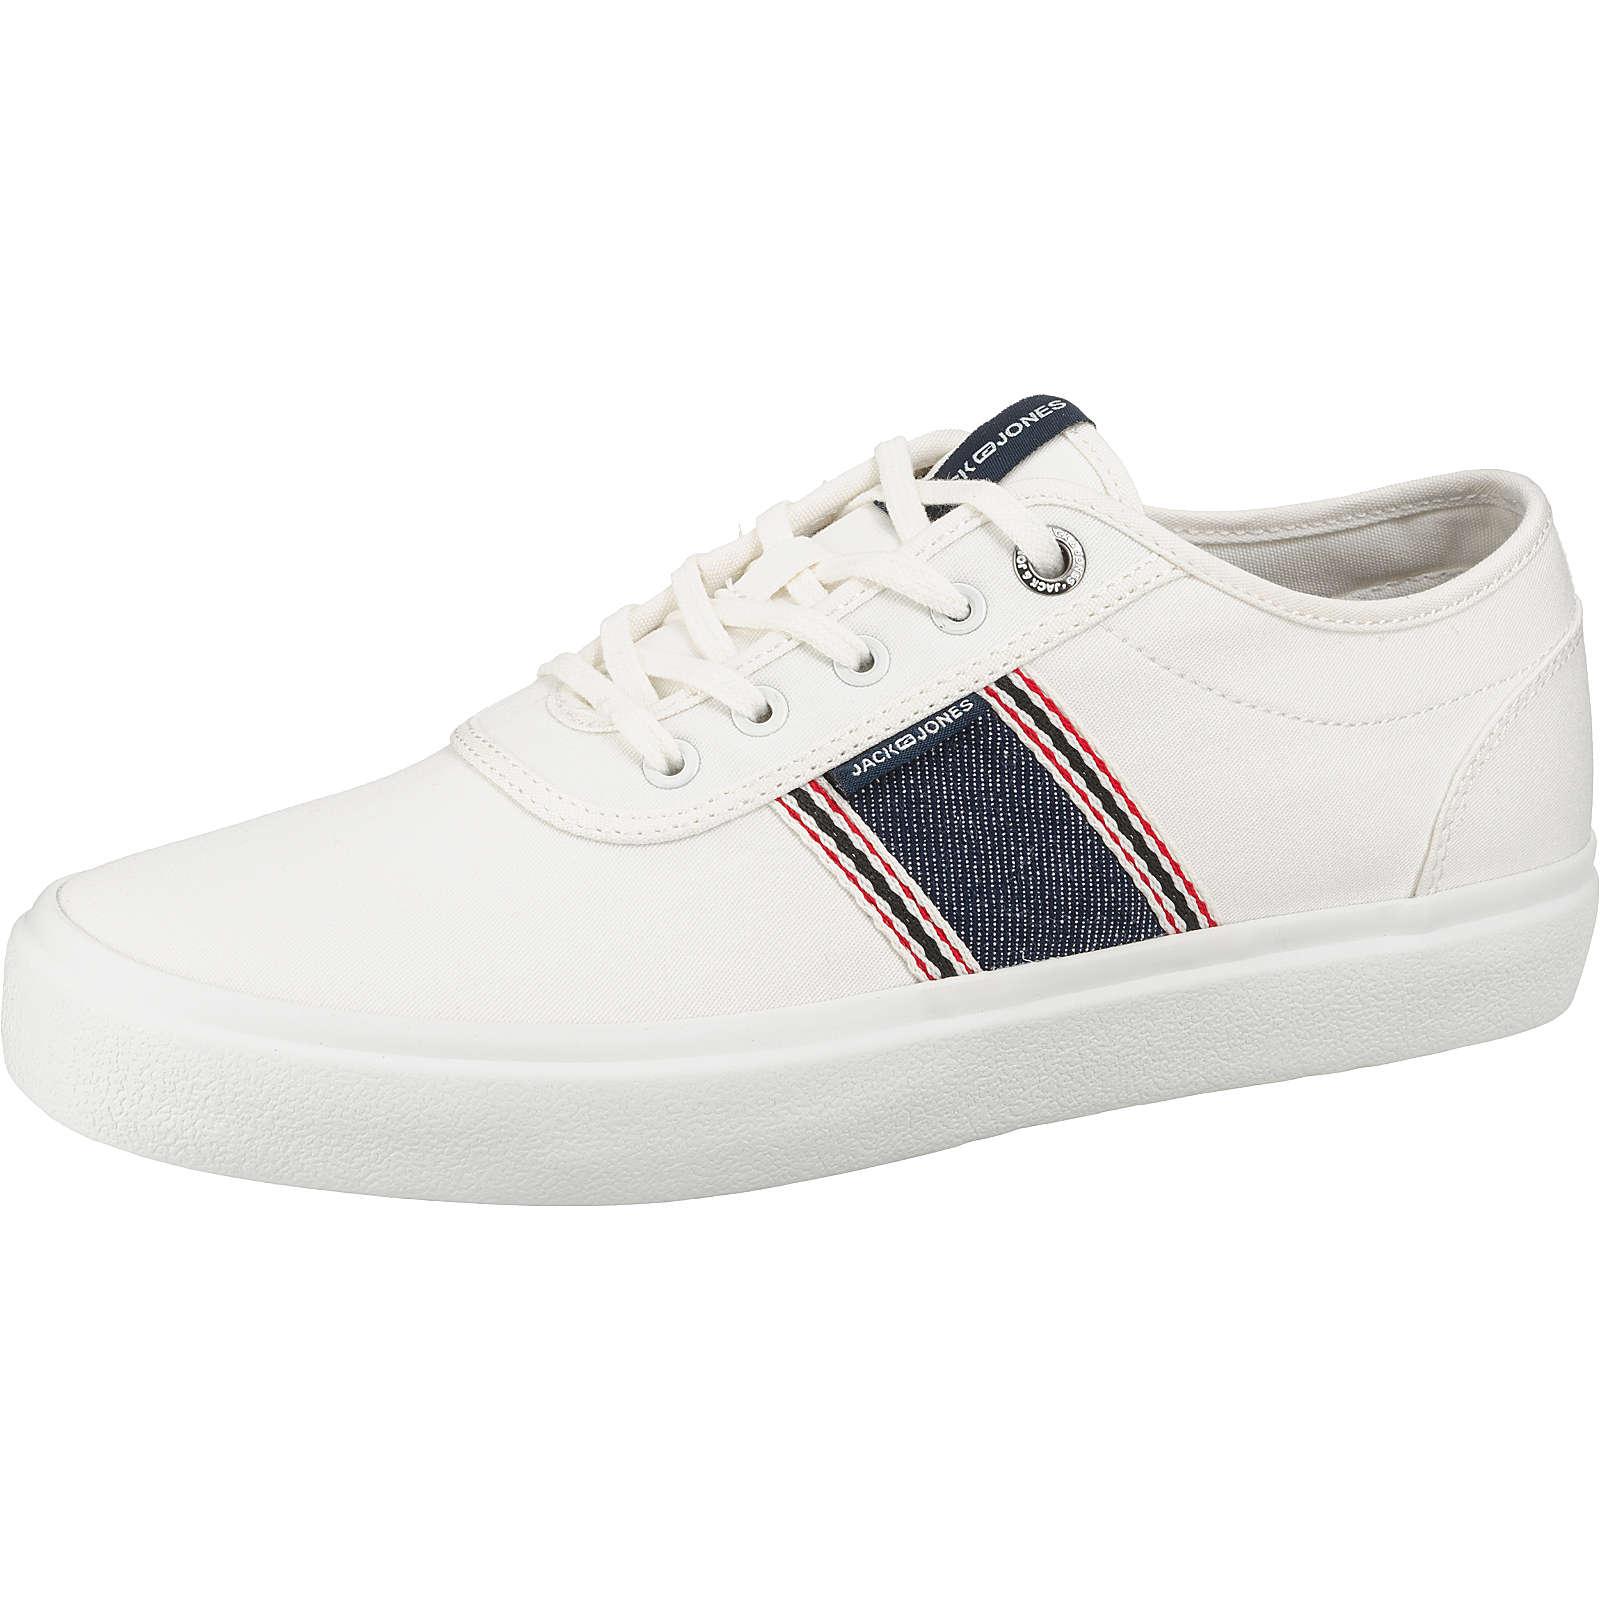 JACK & JONES JFWAUSTIN DENIM STRIPE BRIGHT WHITE Sneakers Low dunkelblau Herren Gr. 42